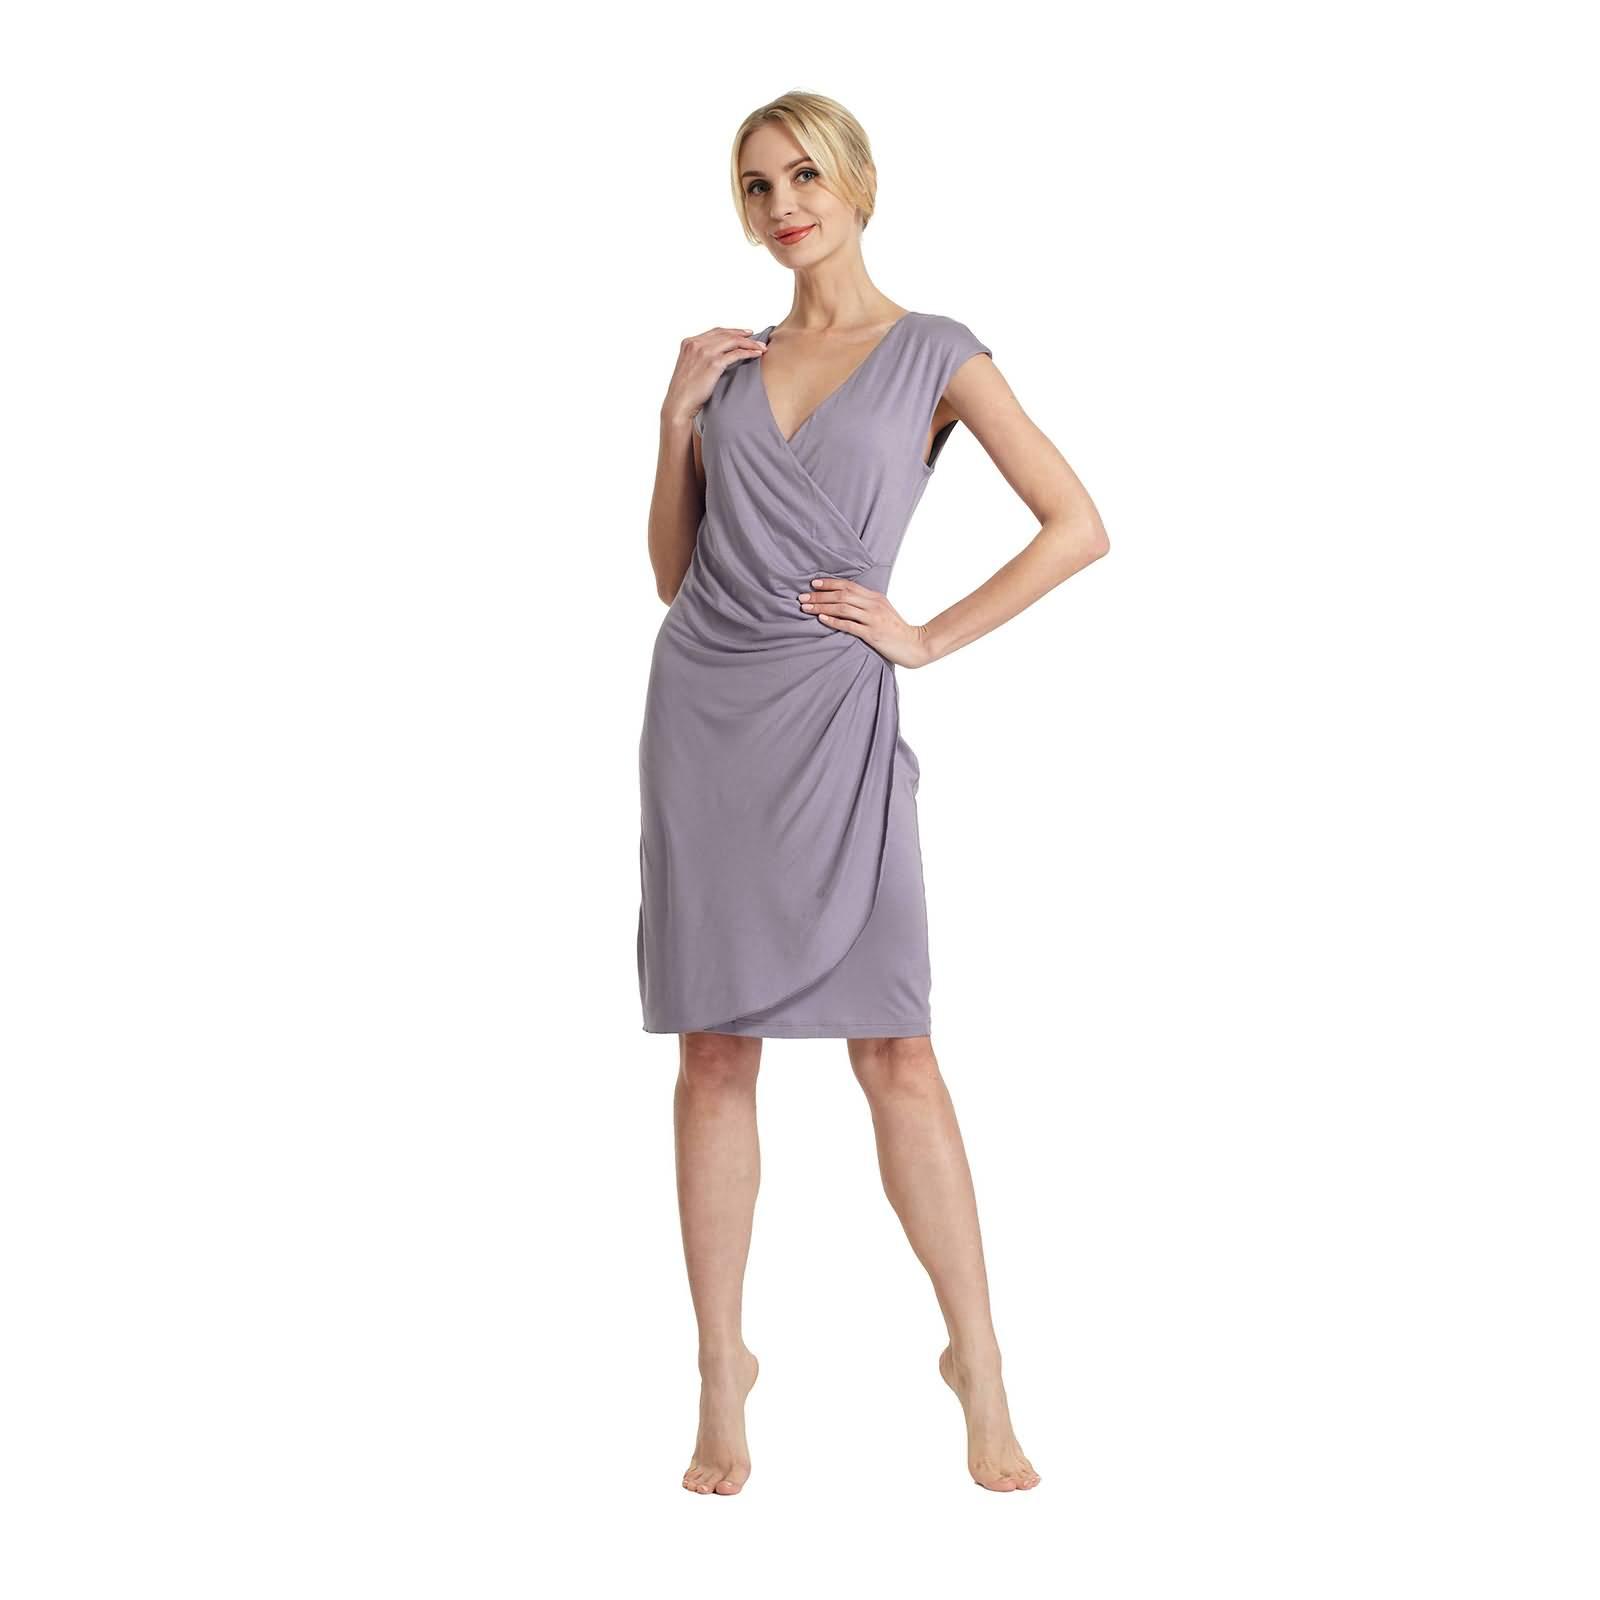 Raikou Damen Etui Kleid Jersey Dress, Knielang, Blusenkleider ...